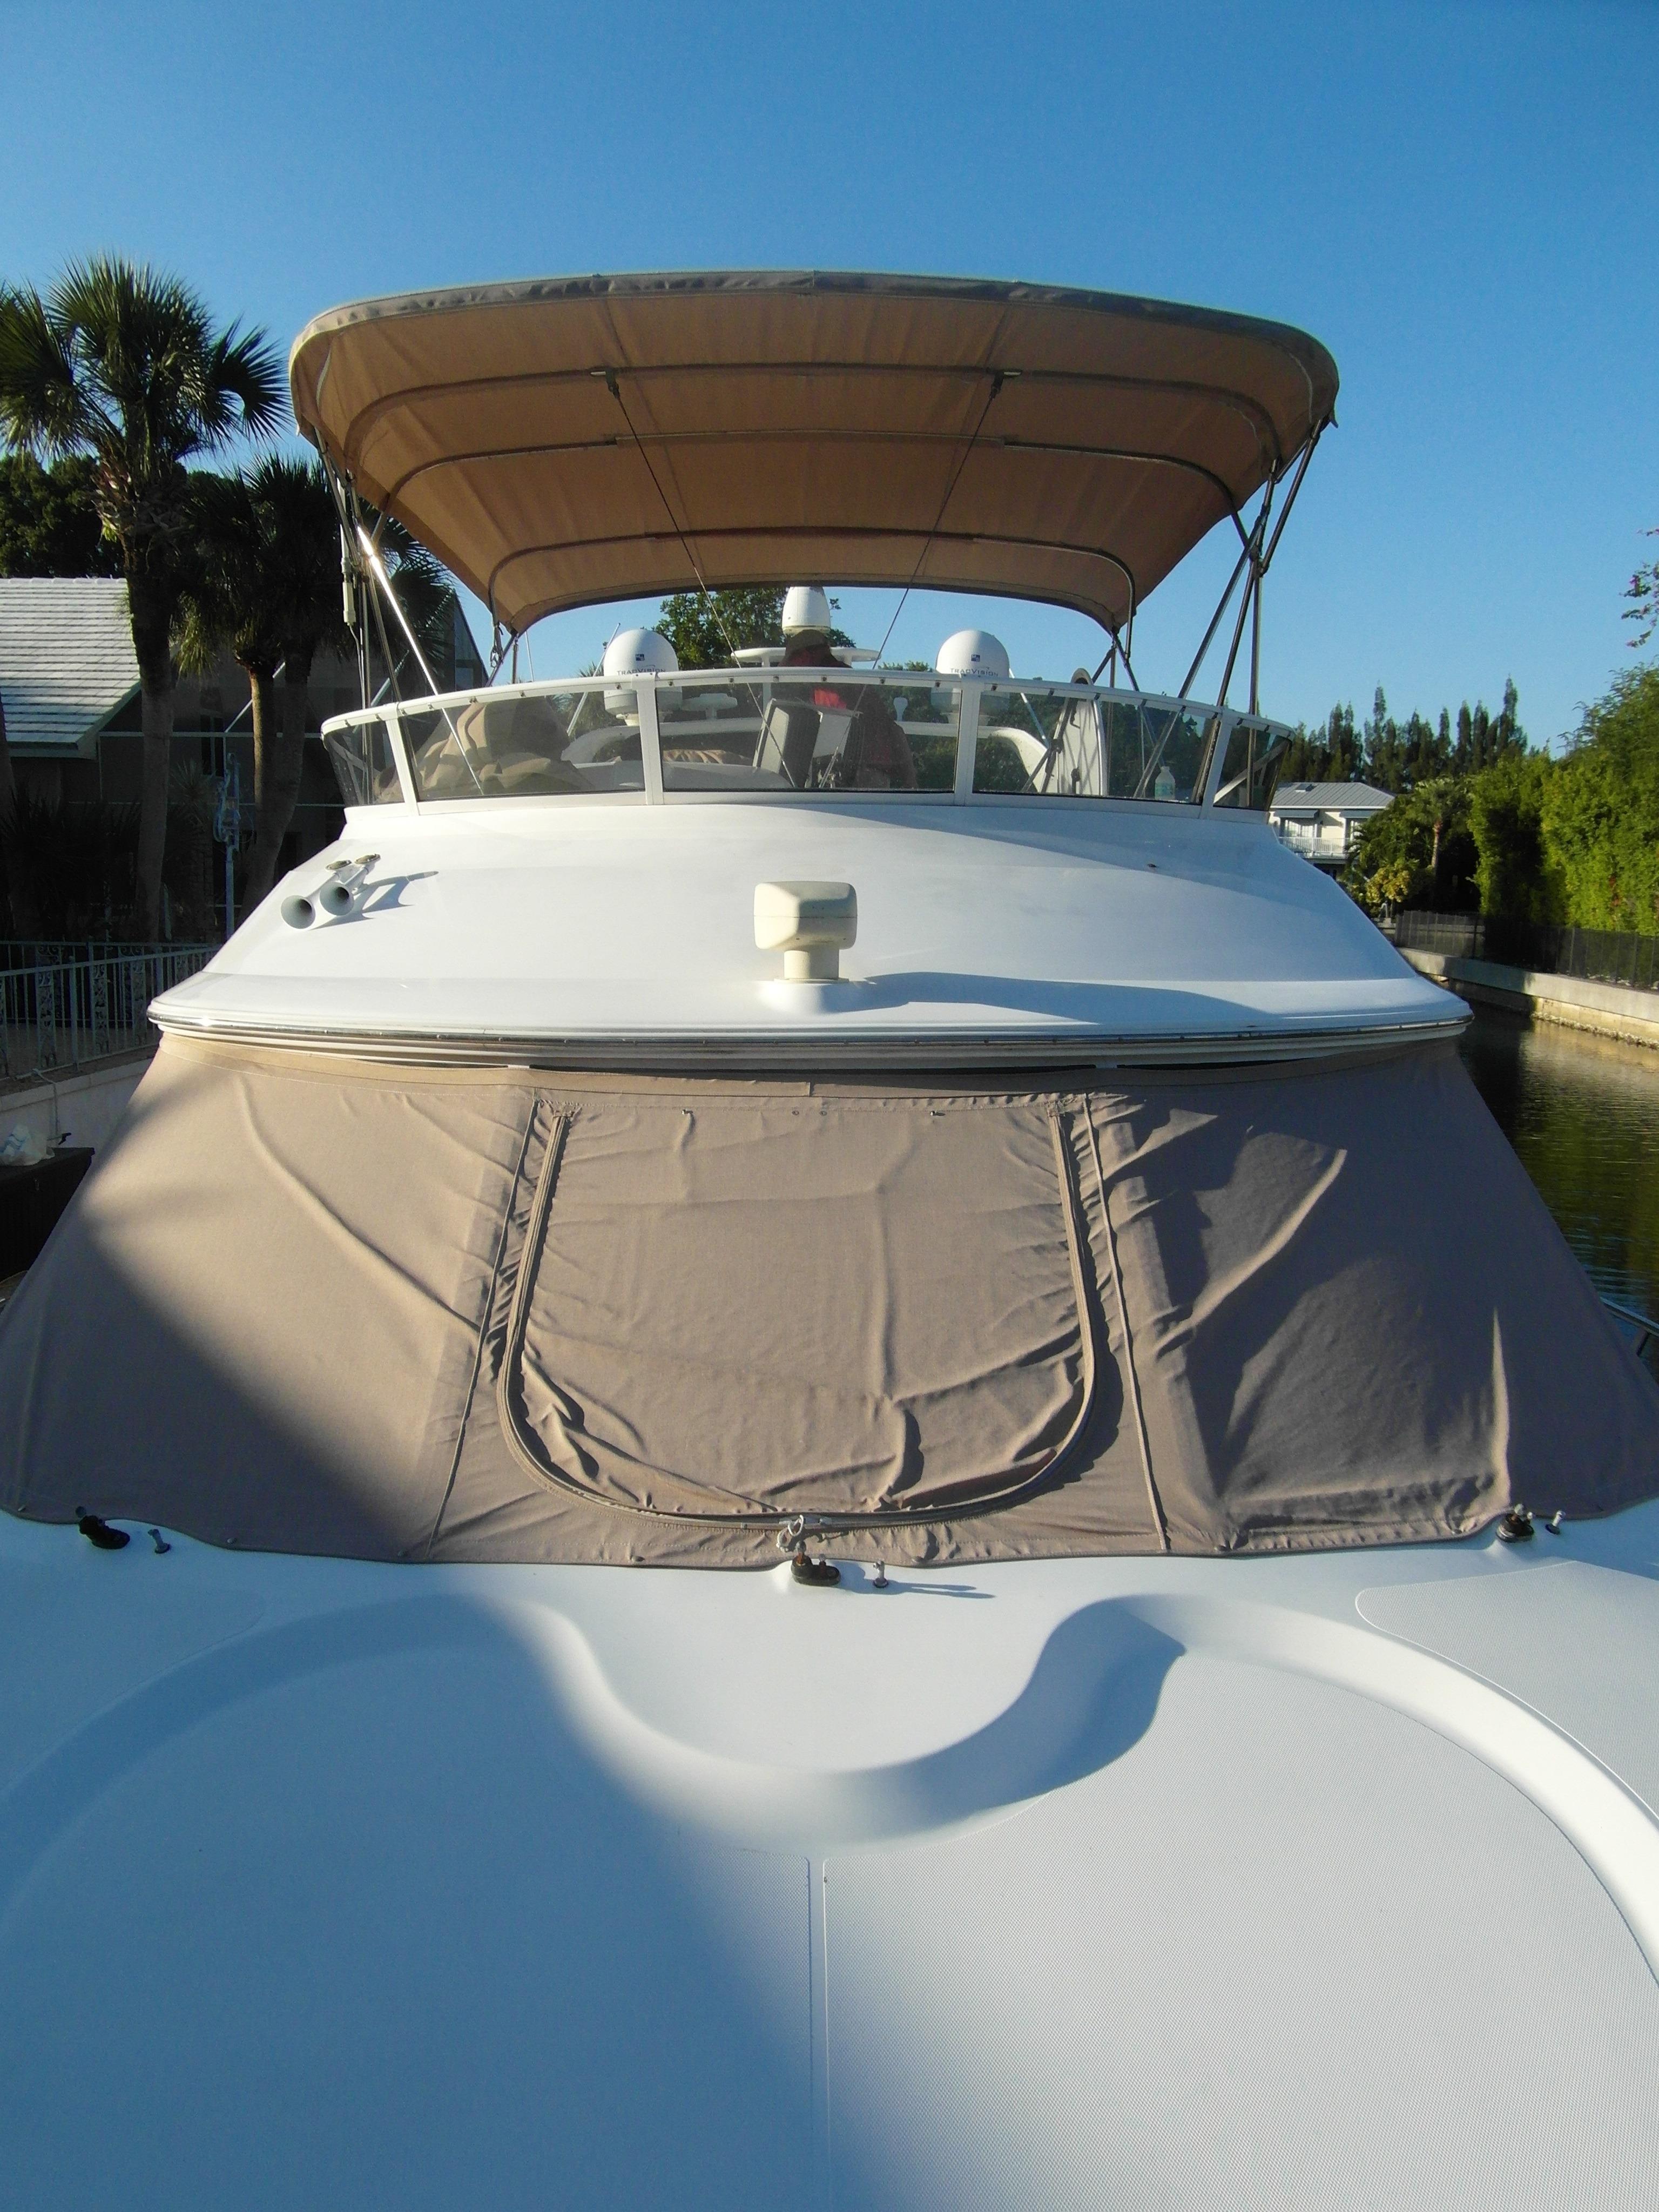 2001 Cruisers 50 Forward Deck / Windshield